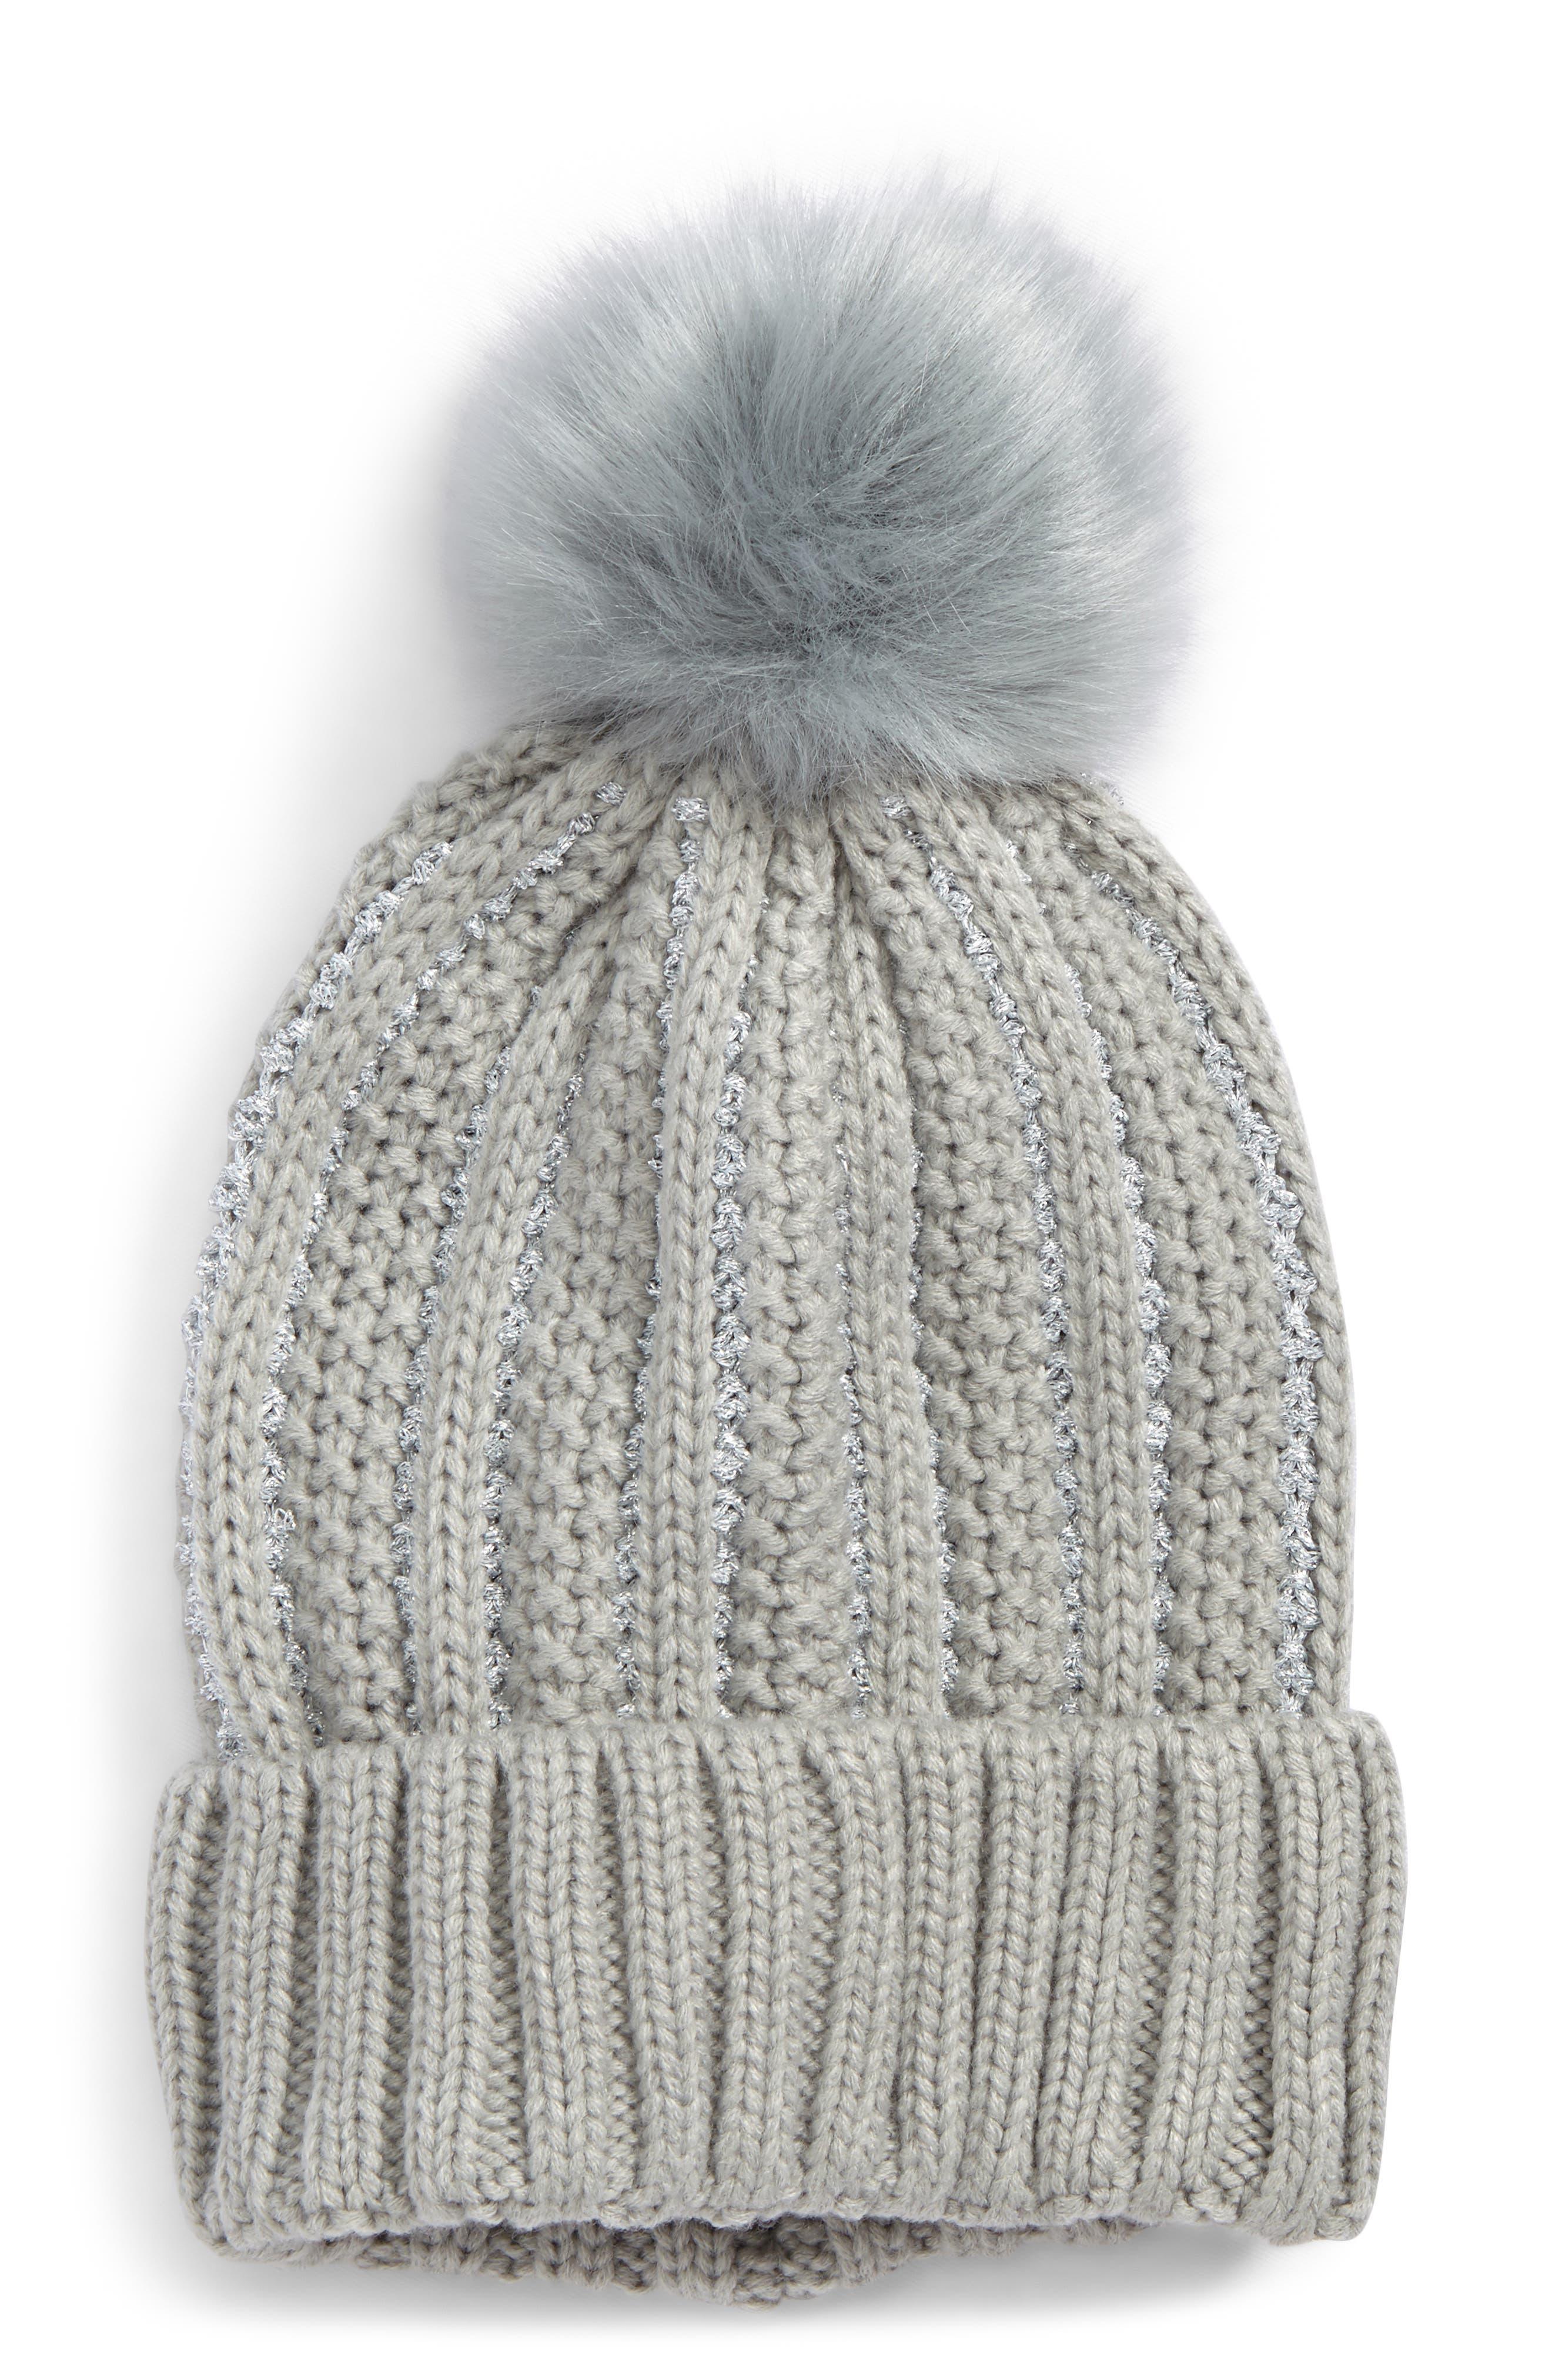 Metallic Knit Beanie with Faux Fur Pompom,                         Main,                         color, Grey